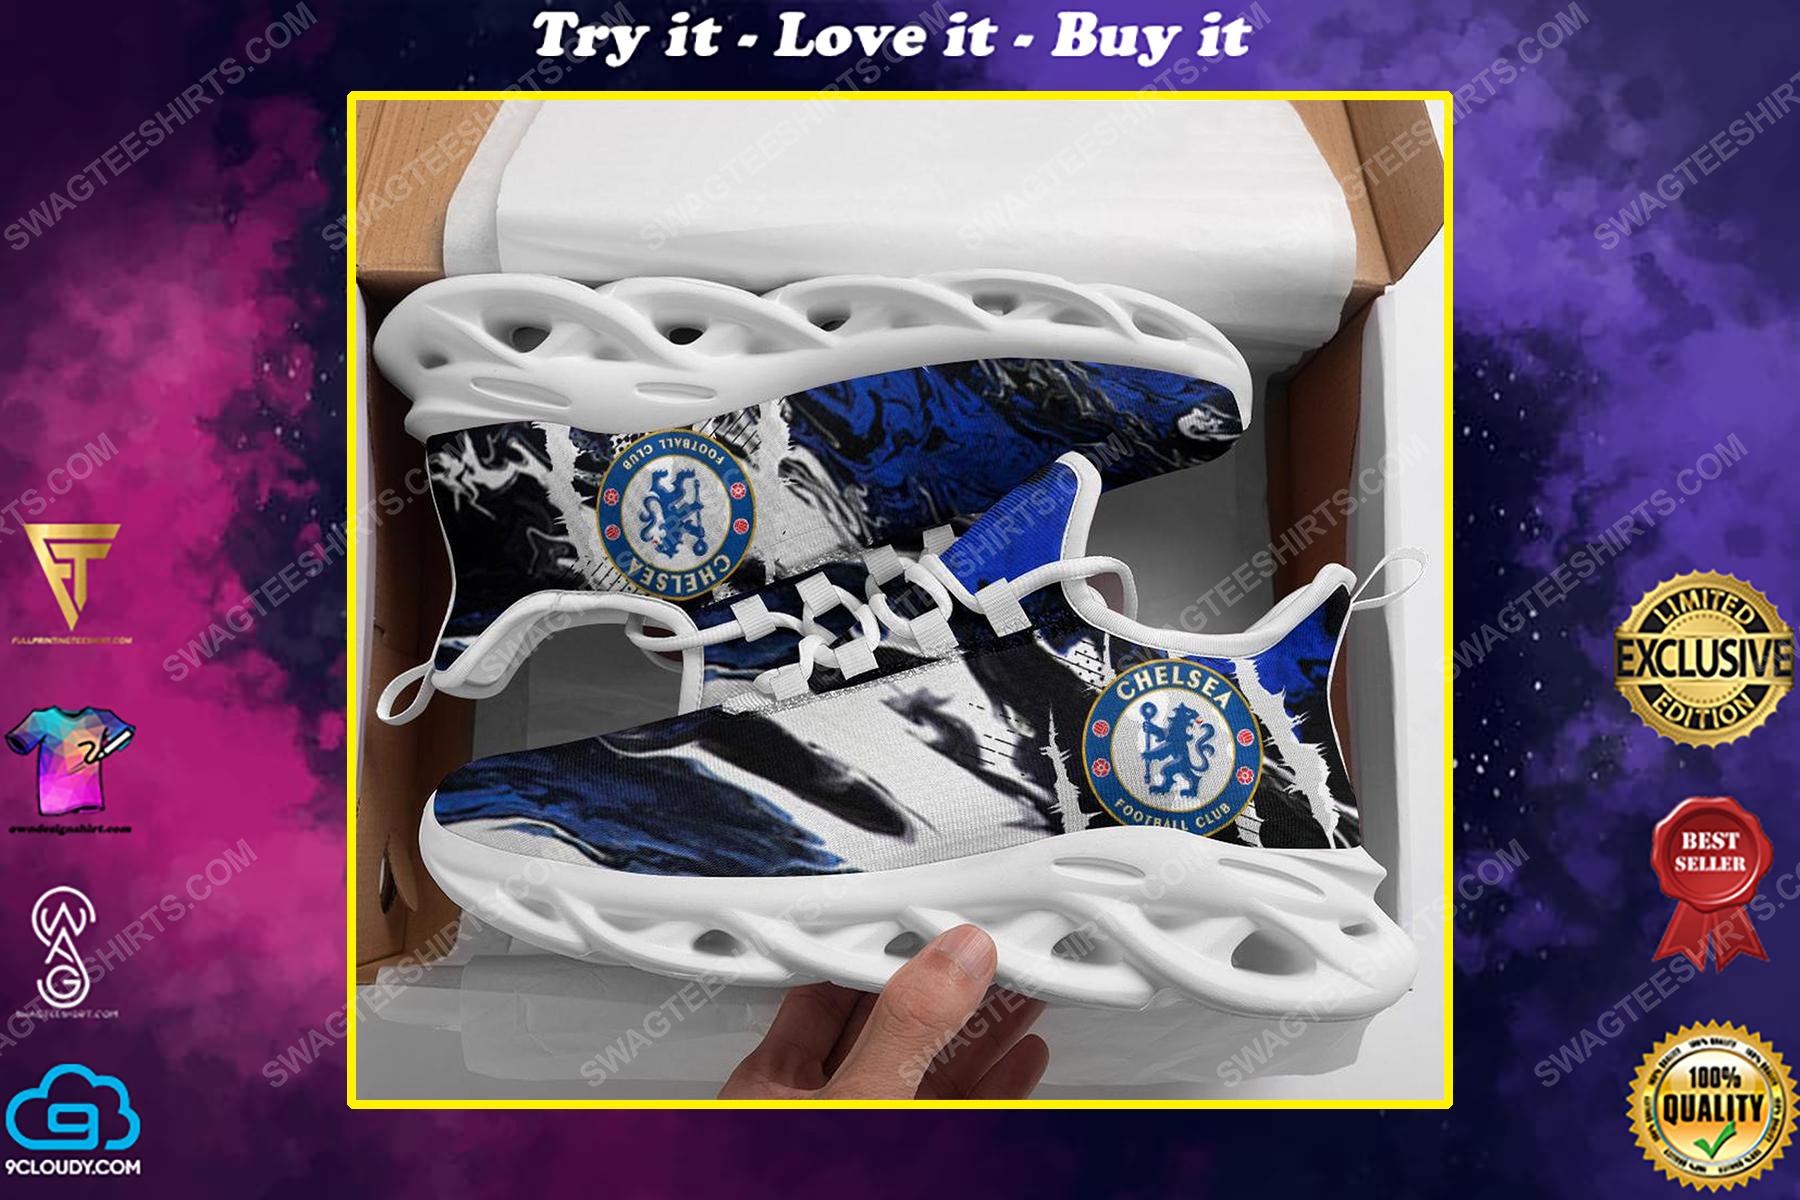 Chelsea football club max soul shoes